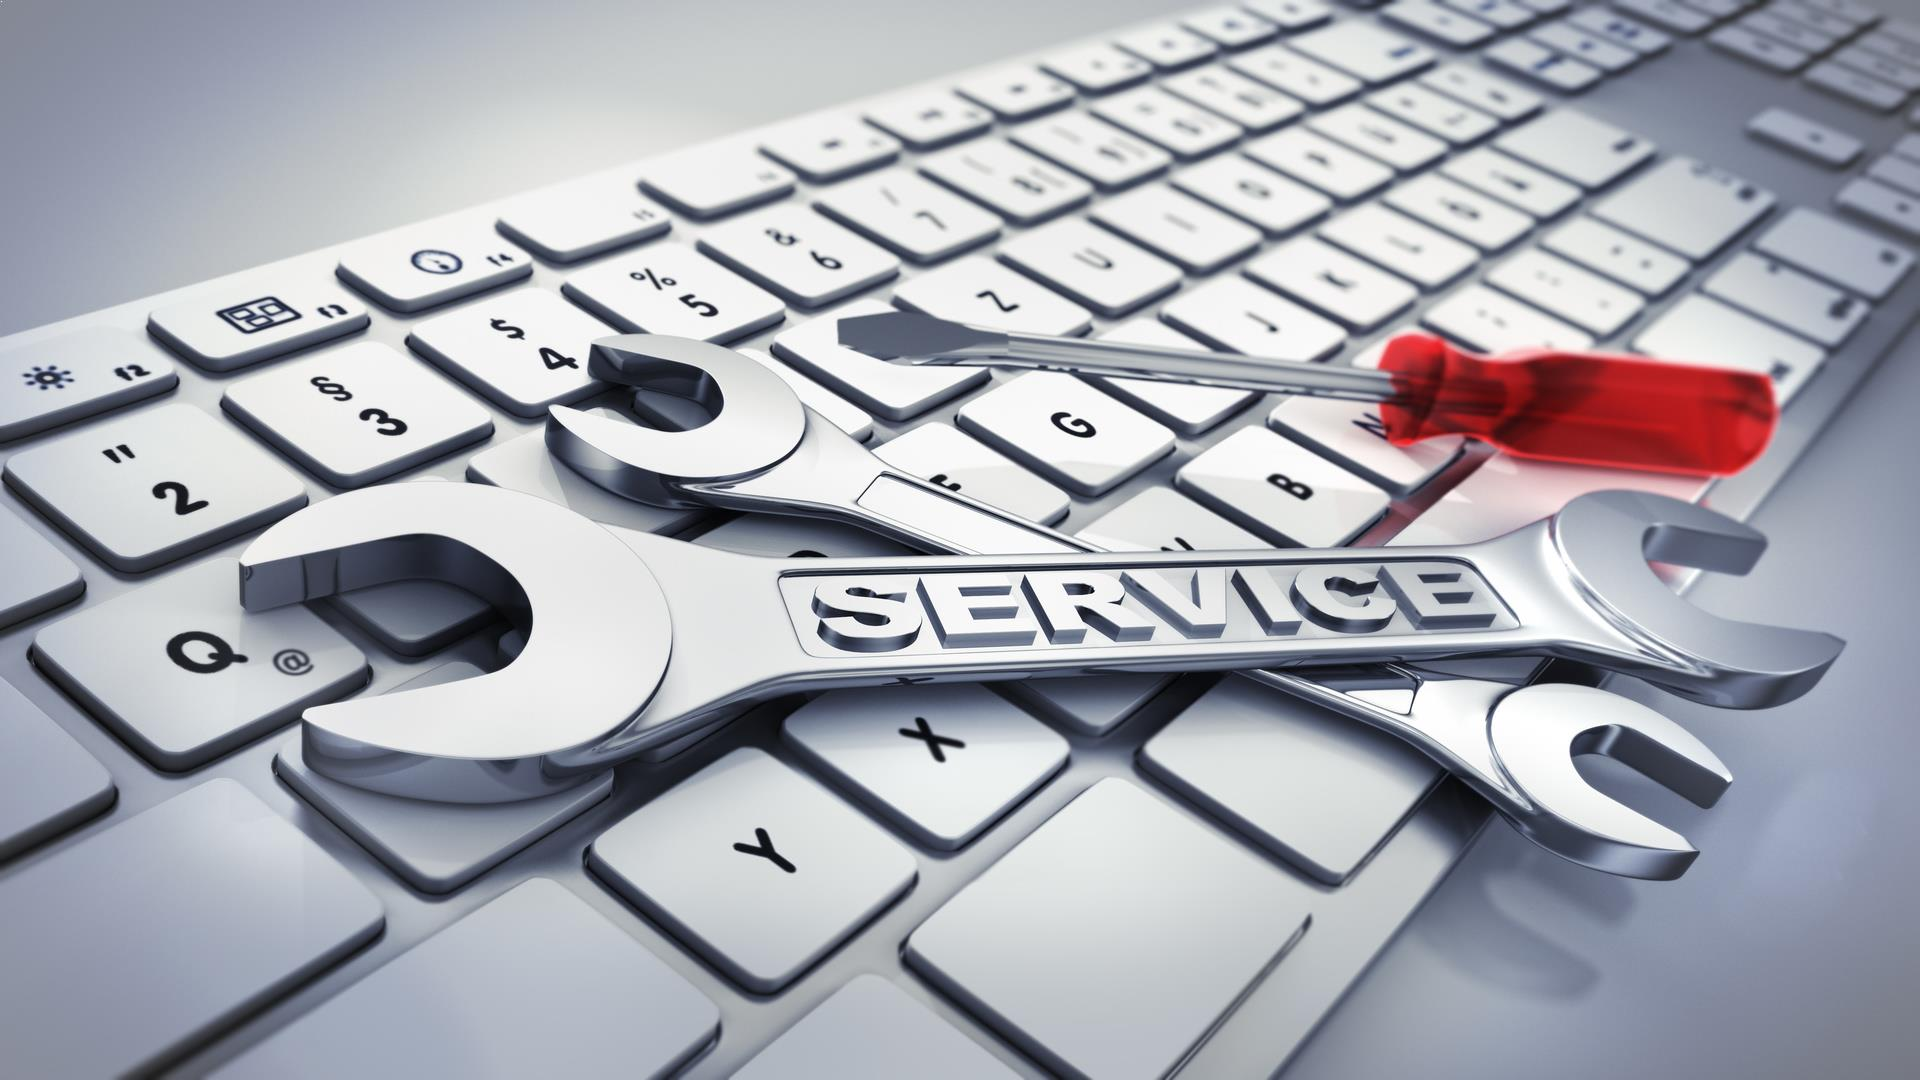 Ewritingpal Com - Understanding Identity Protection